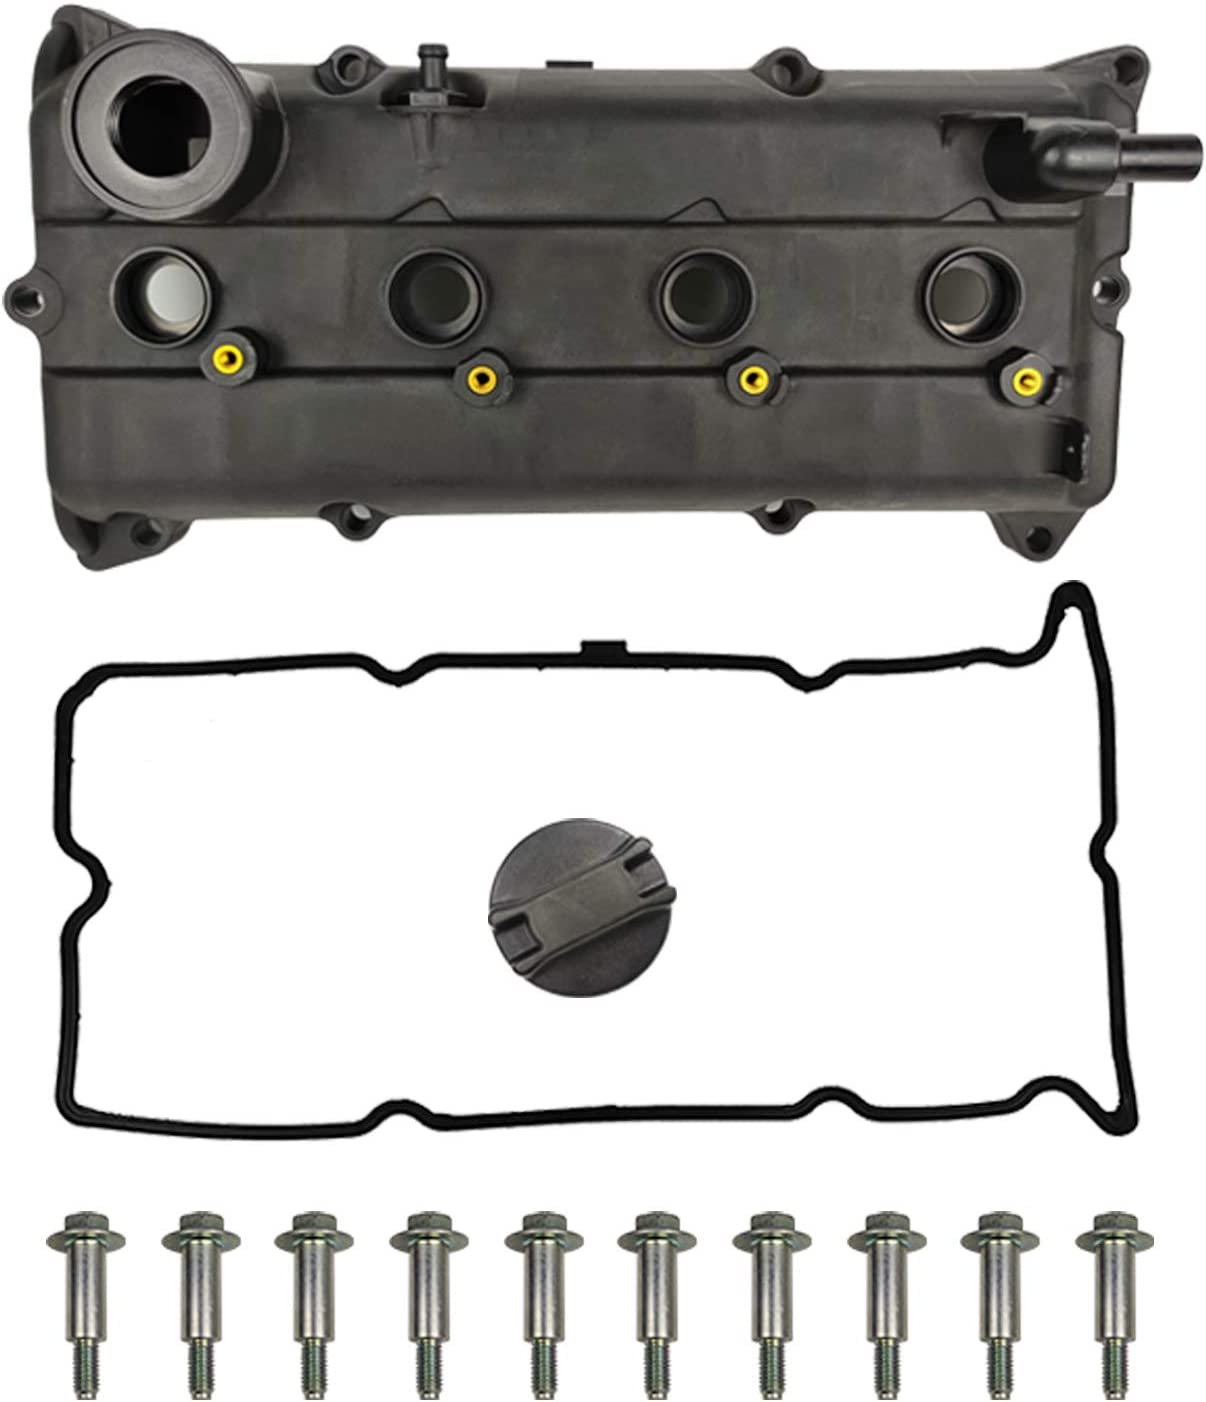 Oil Filler Cap Bolts Compatible with 2002-2006 Nissan Altima Sentra 2.5L Replaces#13264-3Z001 13264 3Z001 264-982 Engine Valve Cover Kit w//Gaskets /& Spark Plug Tube Seals Set PCV Valve